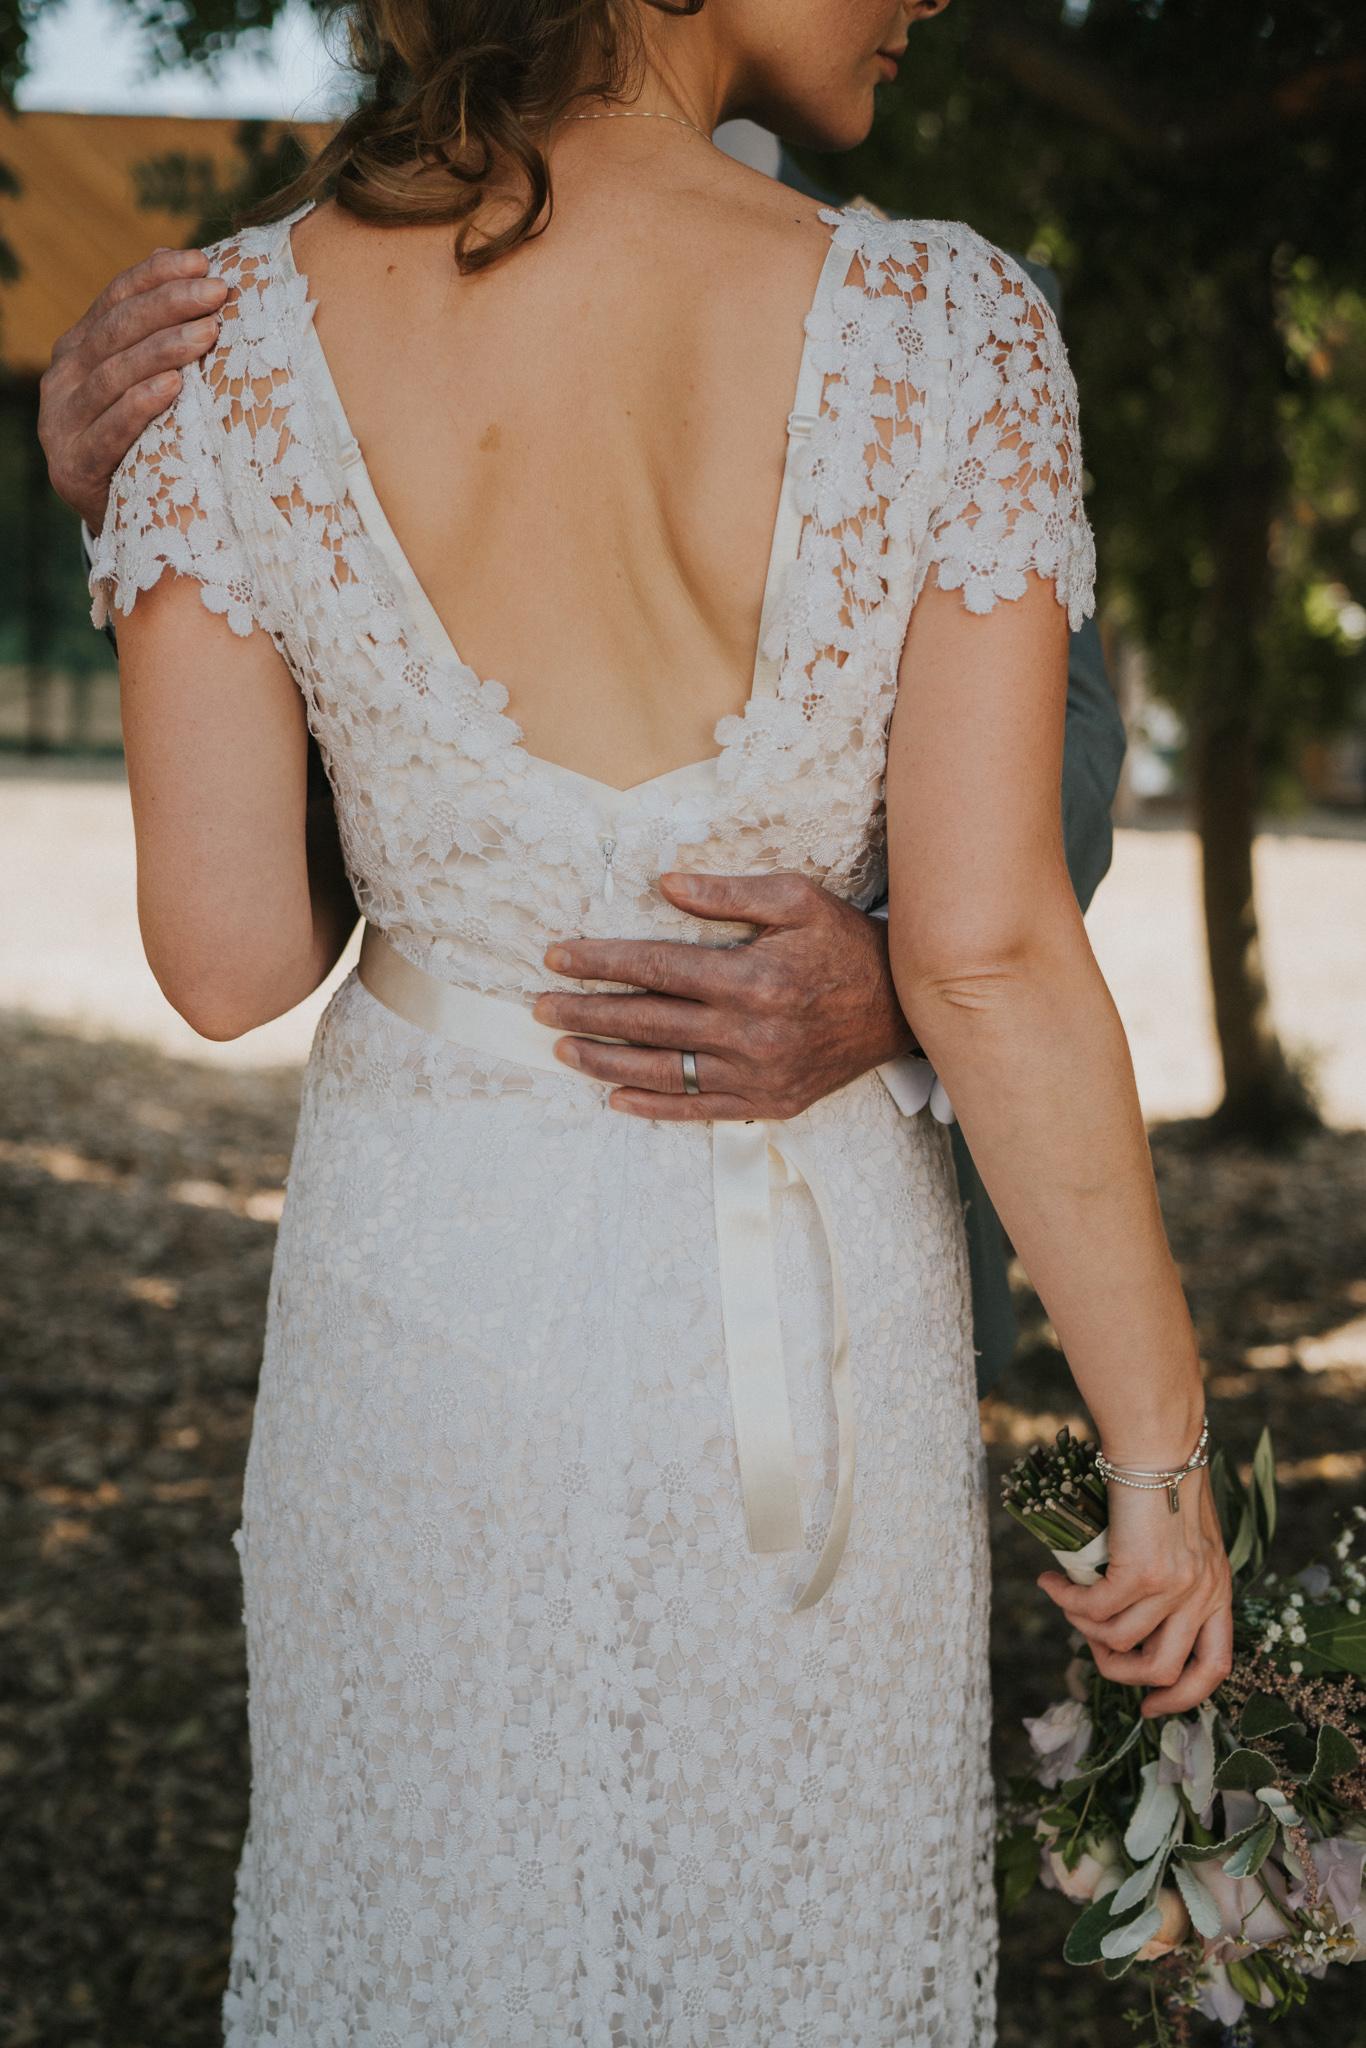 Grace-Elizabeth-Georgie-Amalaketu-Firstsite-Colchester-Essex-Boho-Buddhist-Wedding-Alternative-Wedding-Photography-Essex (81 of 100).jpg